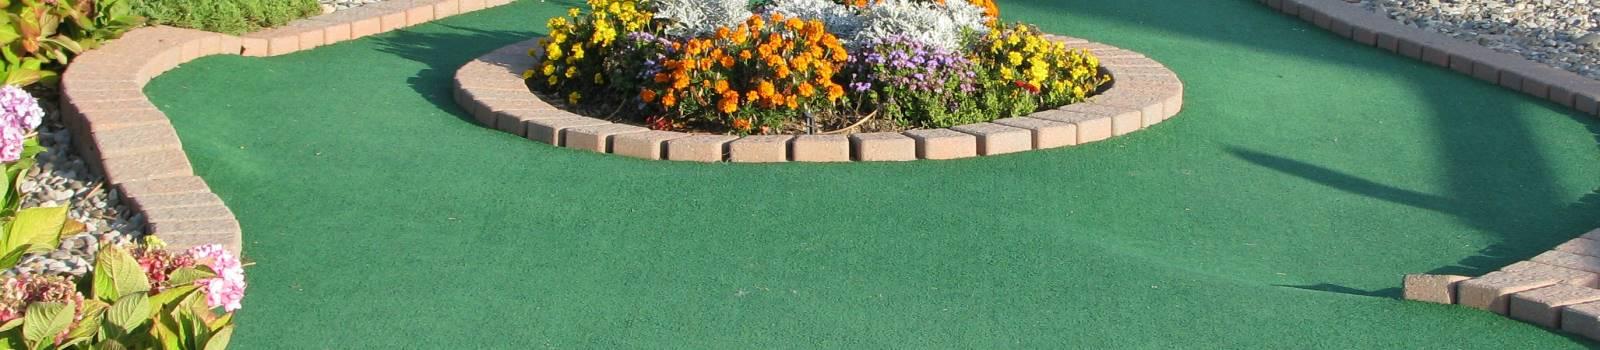 hole 12 mini golf course design